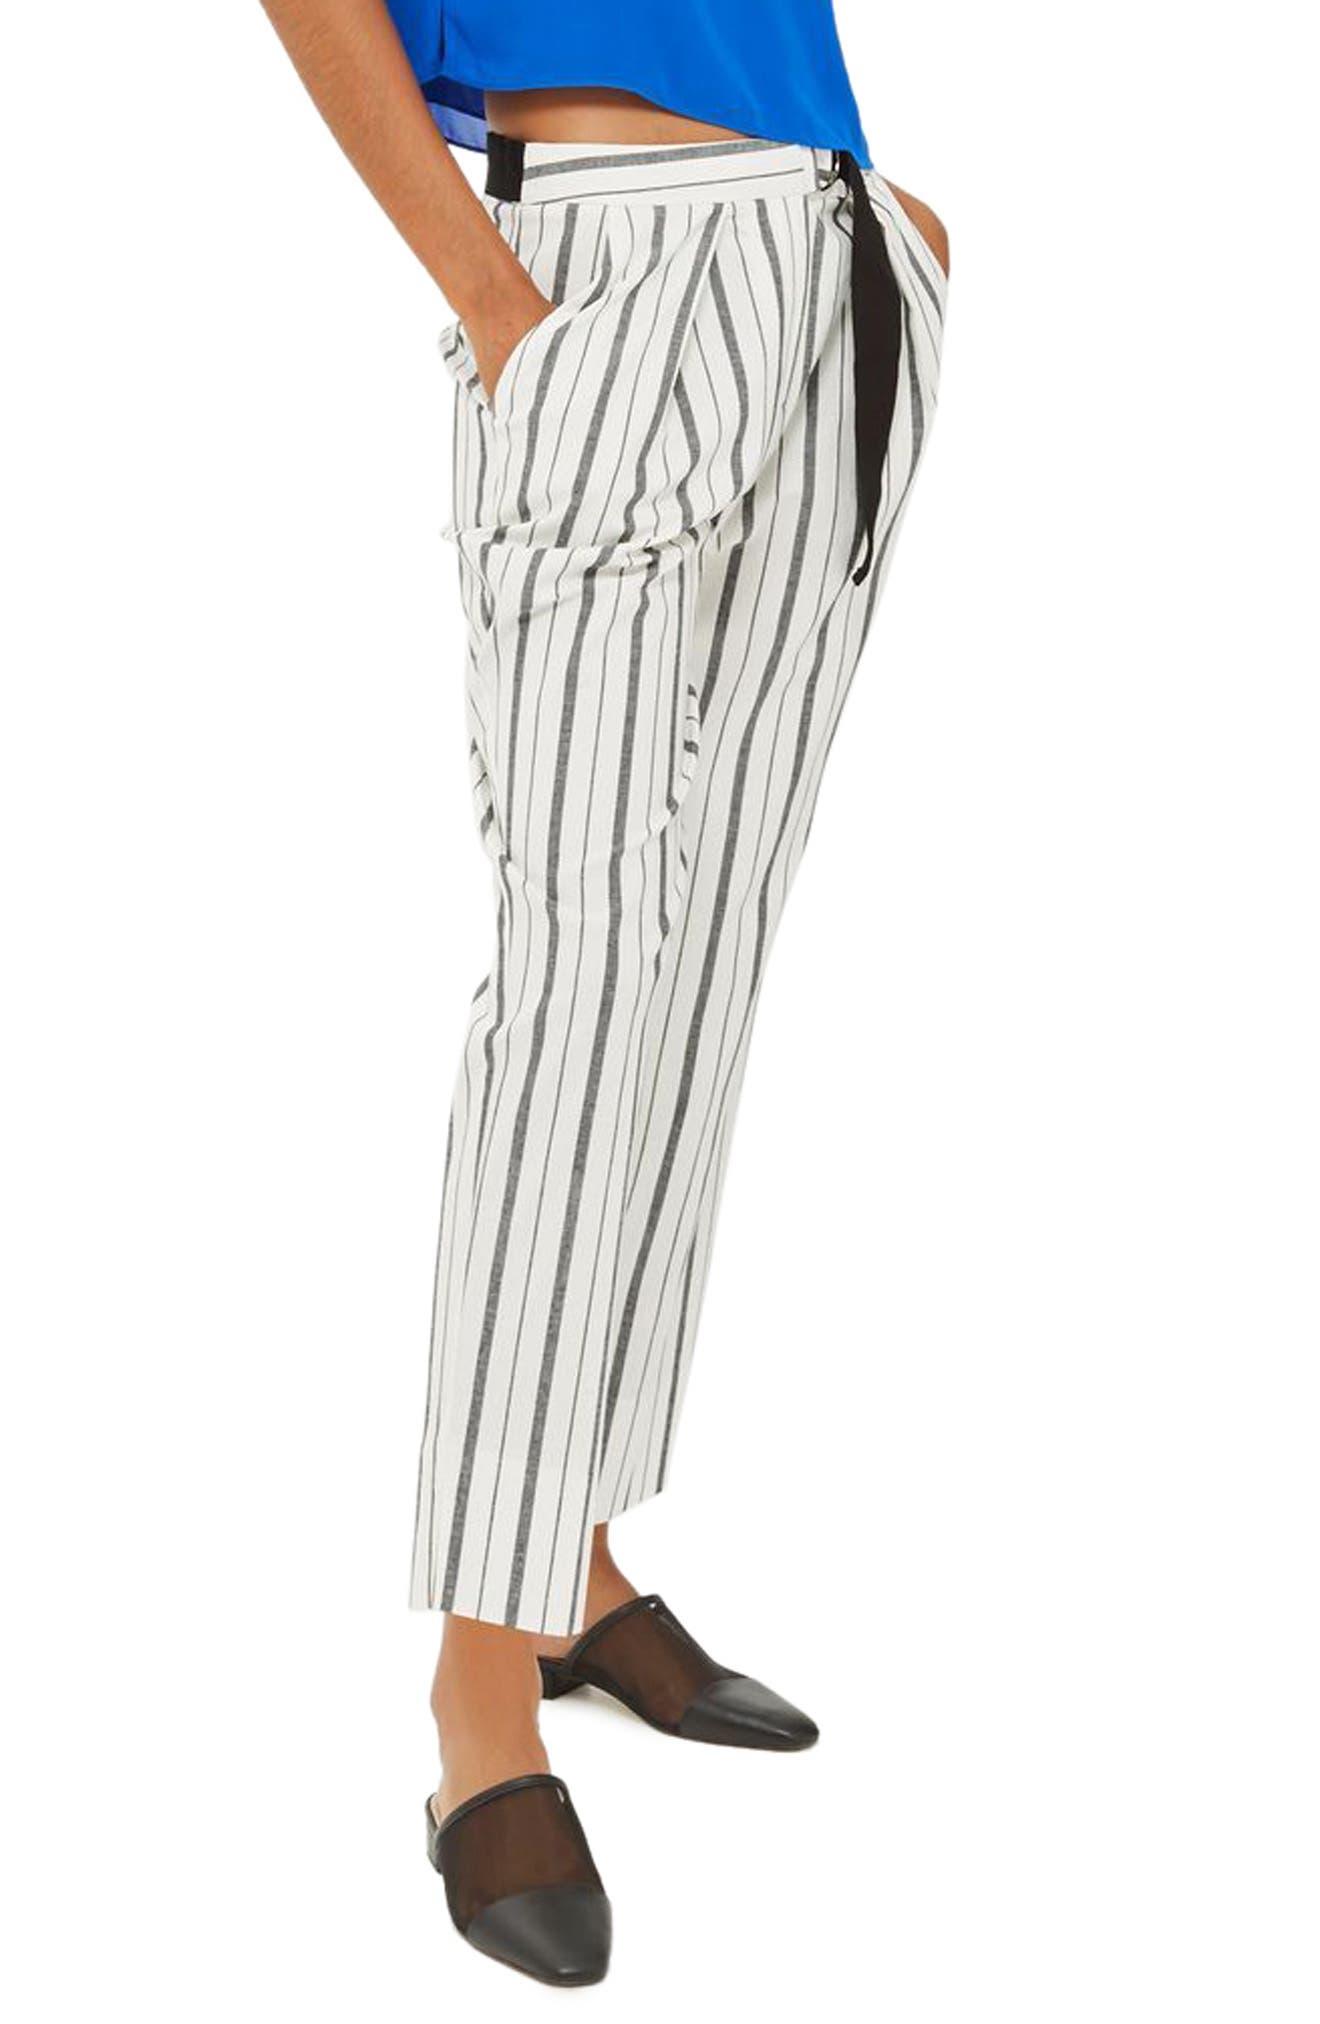 Topshop Stripe Peg Leg Trousers (Petite)